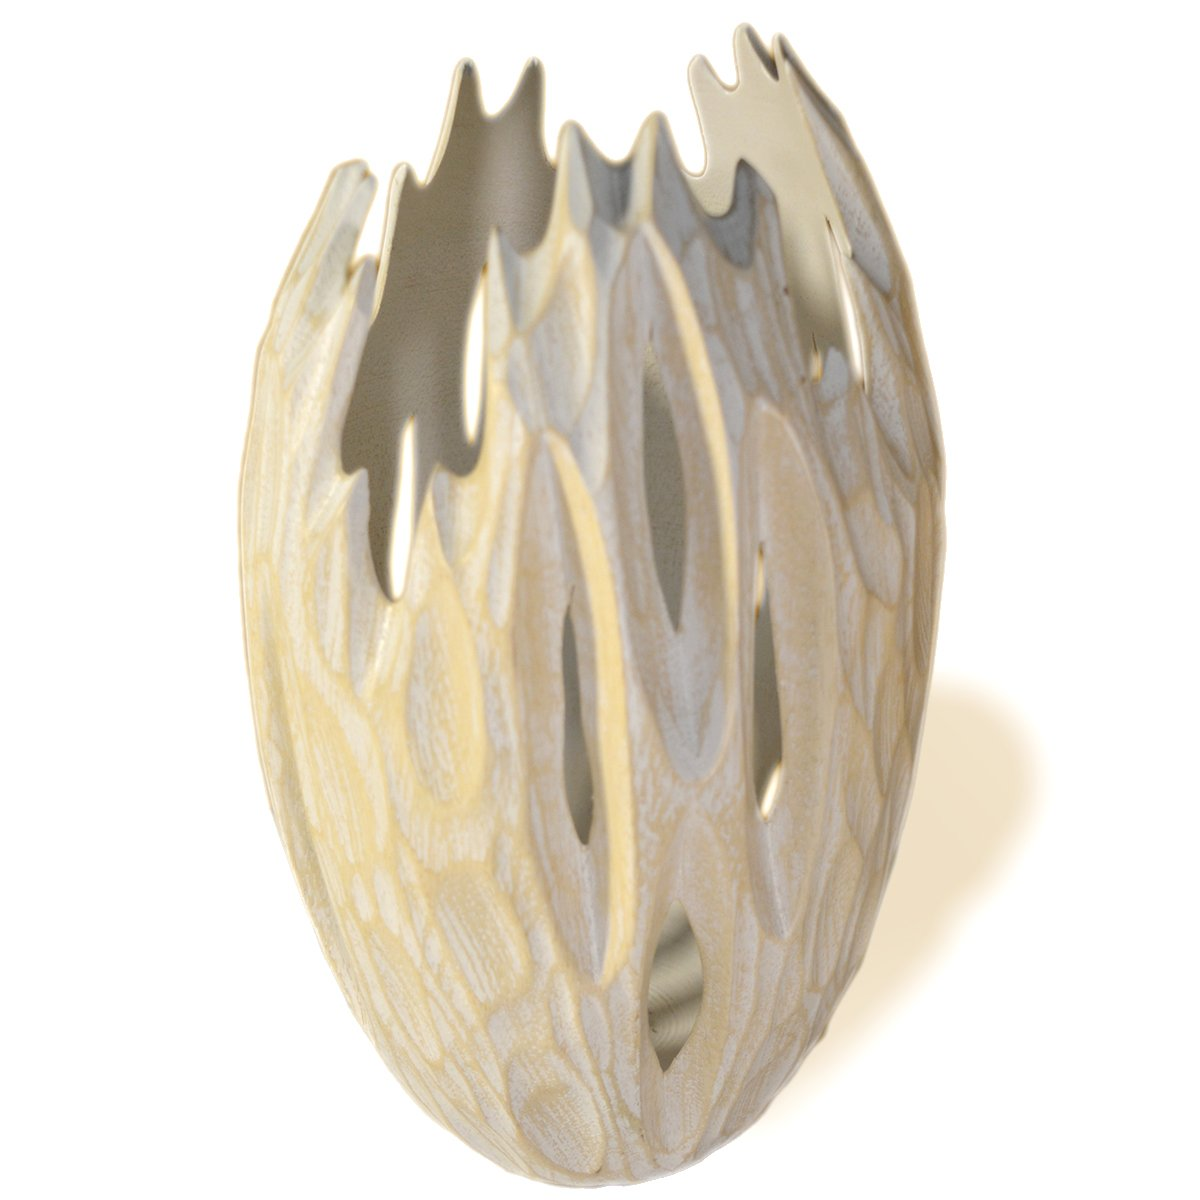 Roro Minimalist Handcarved Wood Vase with Upward Grooves (Whitewash) by roro (Image #1)